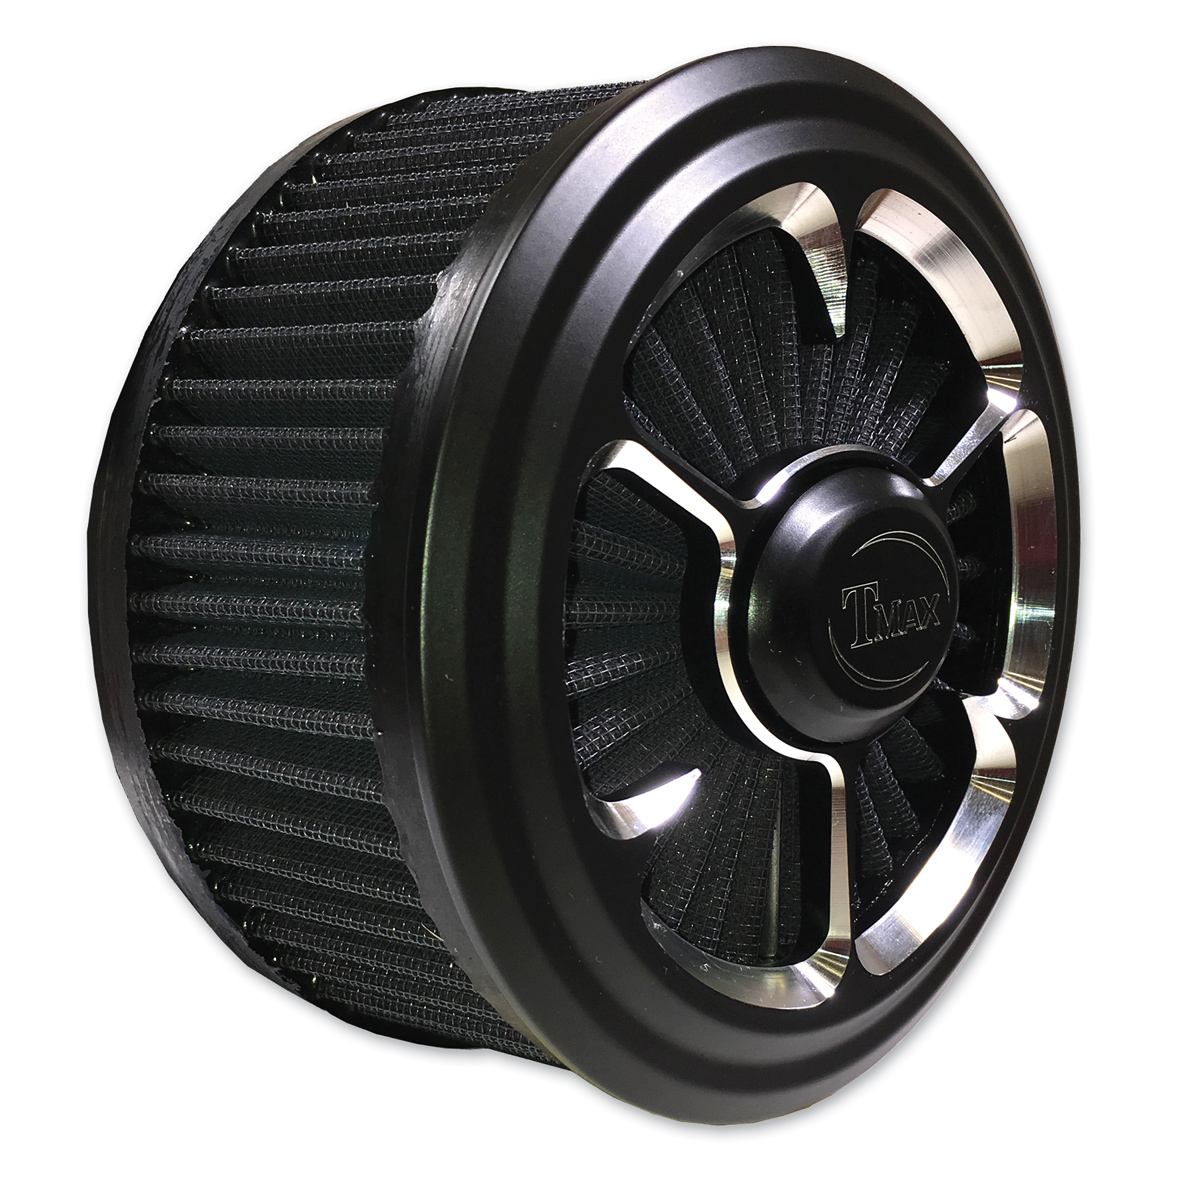 ThunderMax Ballistic 3 Spoke Contrast Cut Air Cleaner